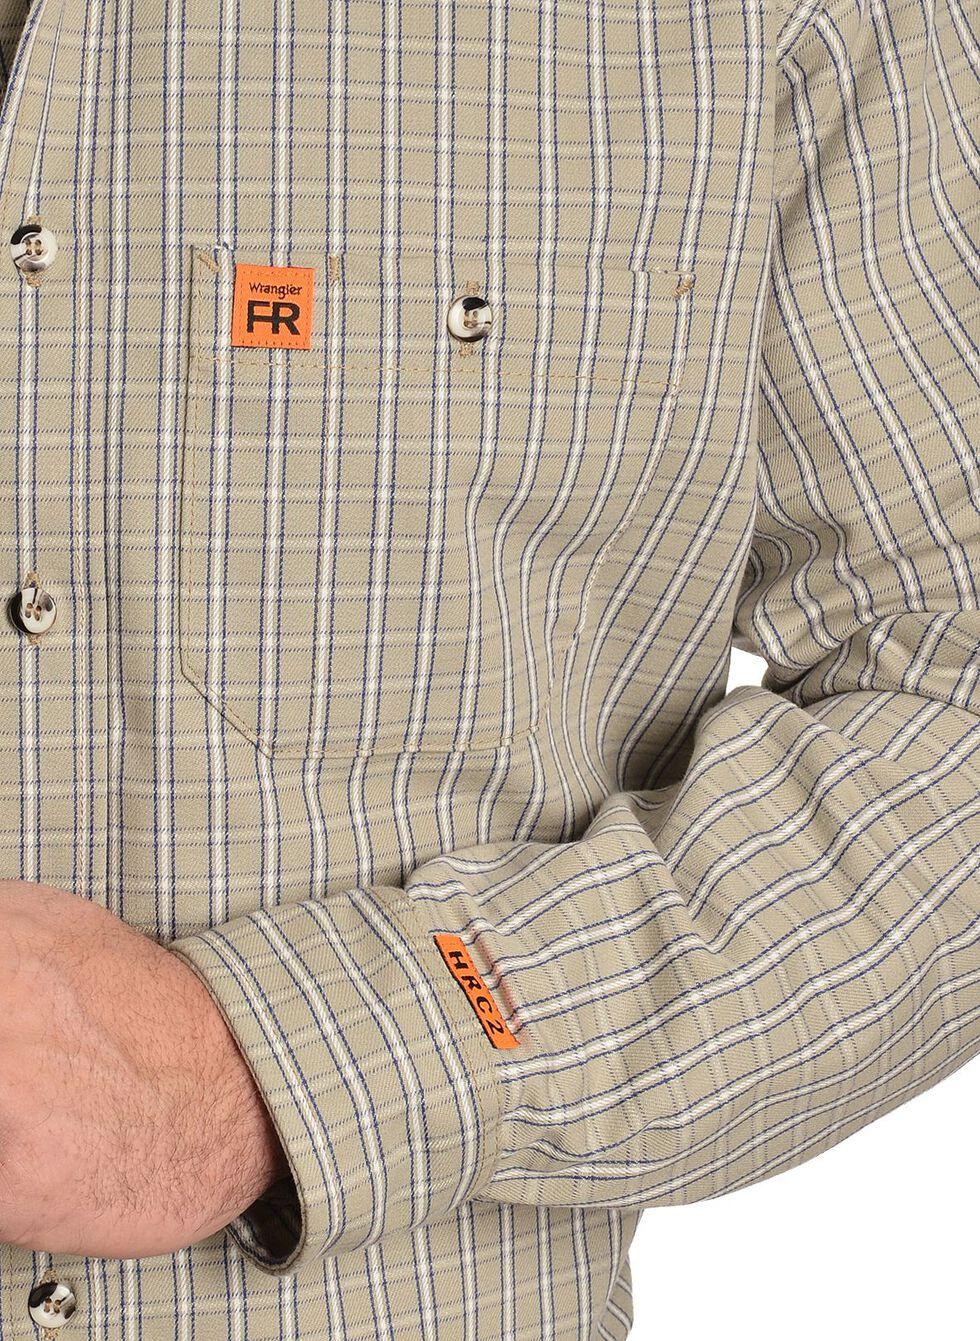 Wrangler Flame Resistant RIGGS Work Shirt, Khaki, hi-res